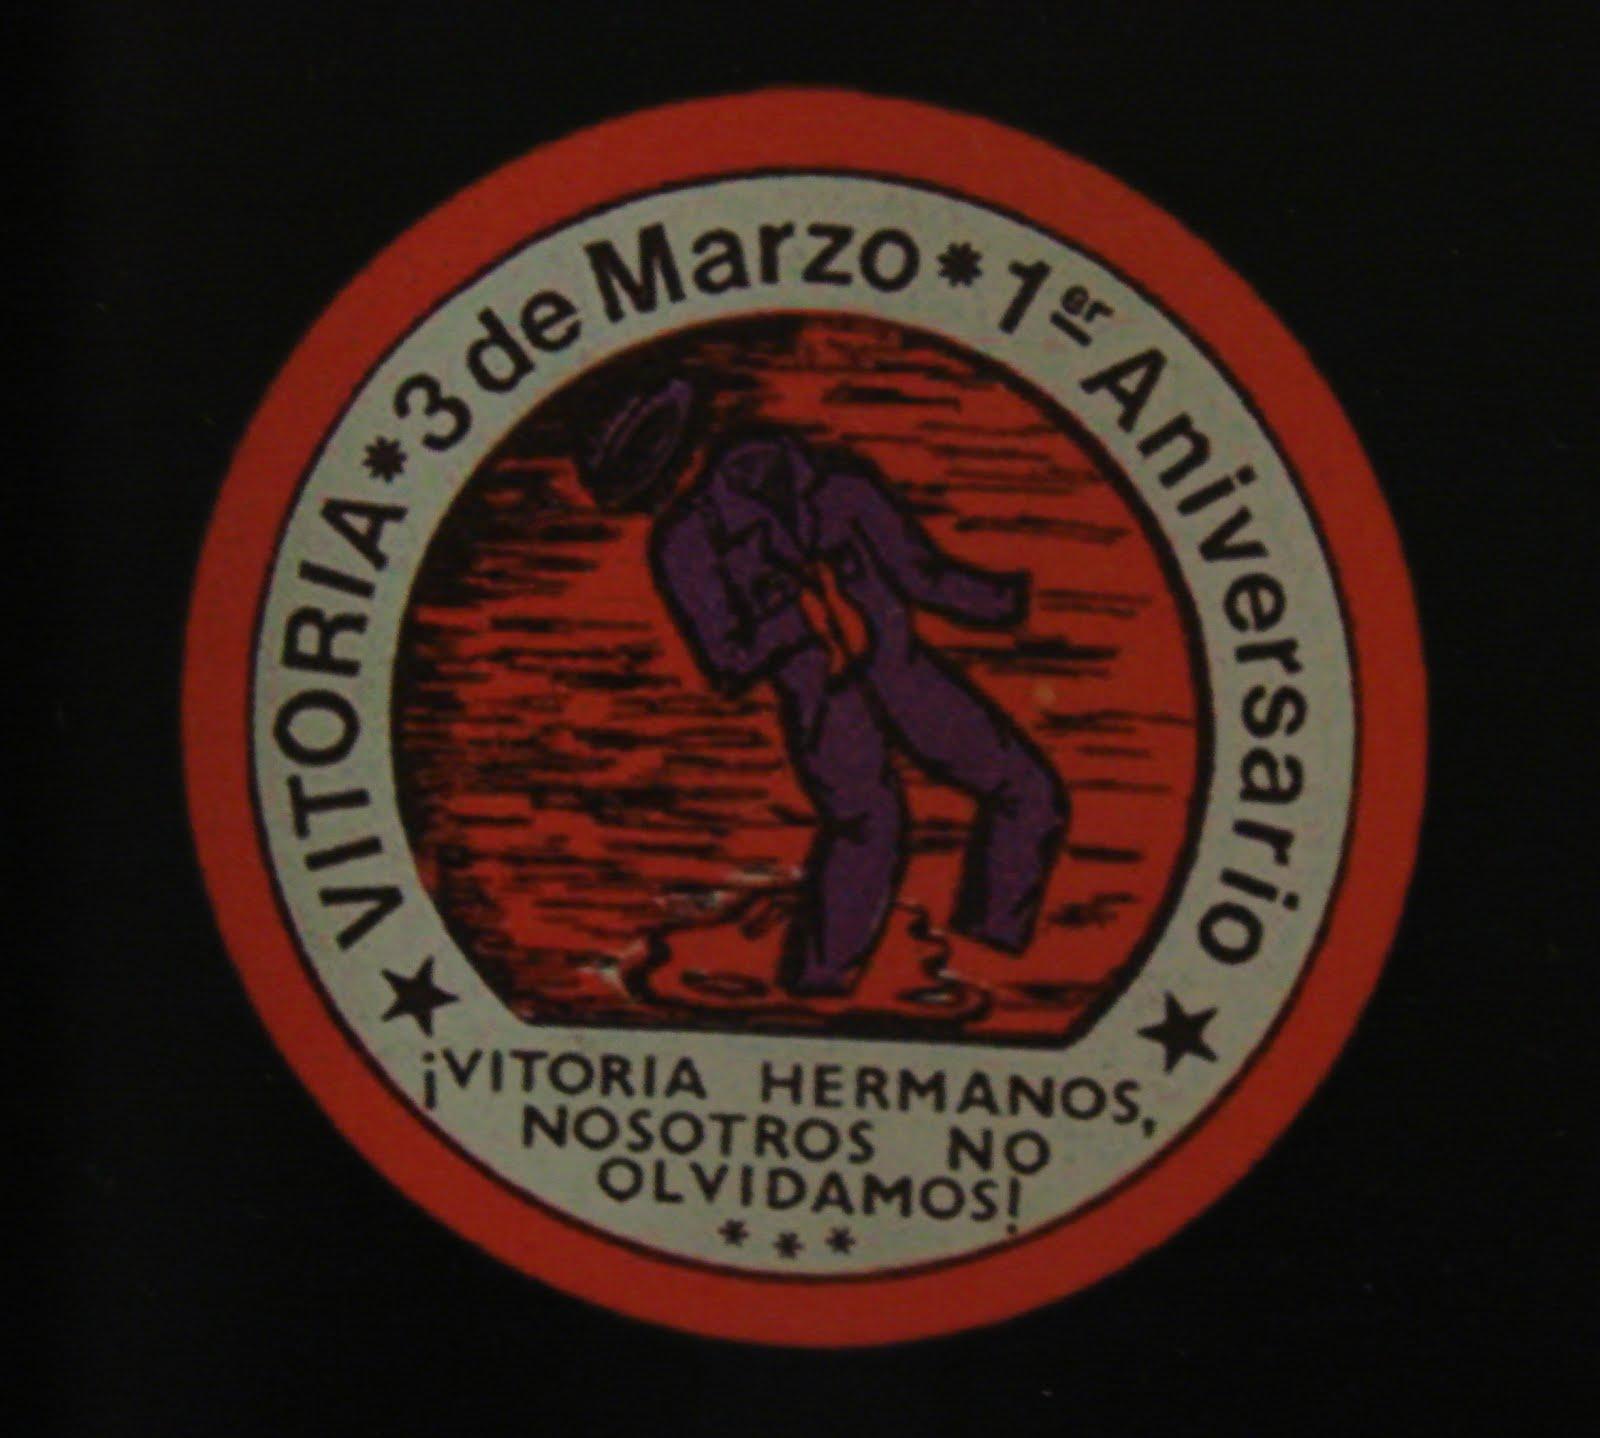 EXPOSICIÓ MARTXOAK 3 DE MARZO VITORIA-GASTEIZ 1976 A L'EUSKAL ETXEA BARCELONA